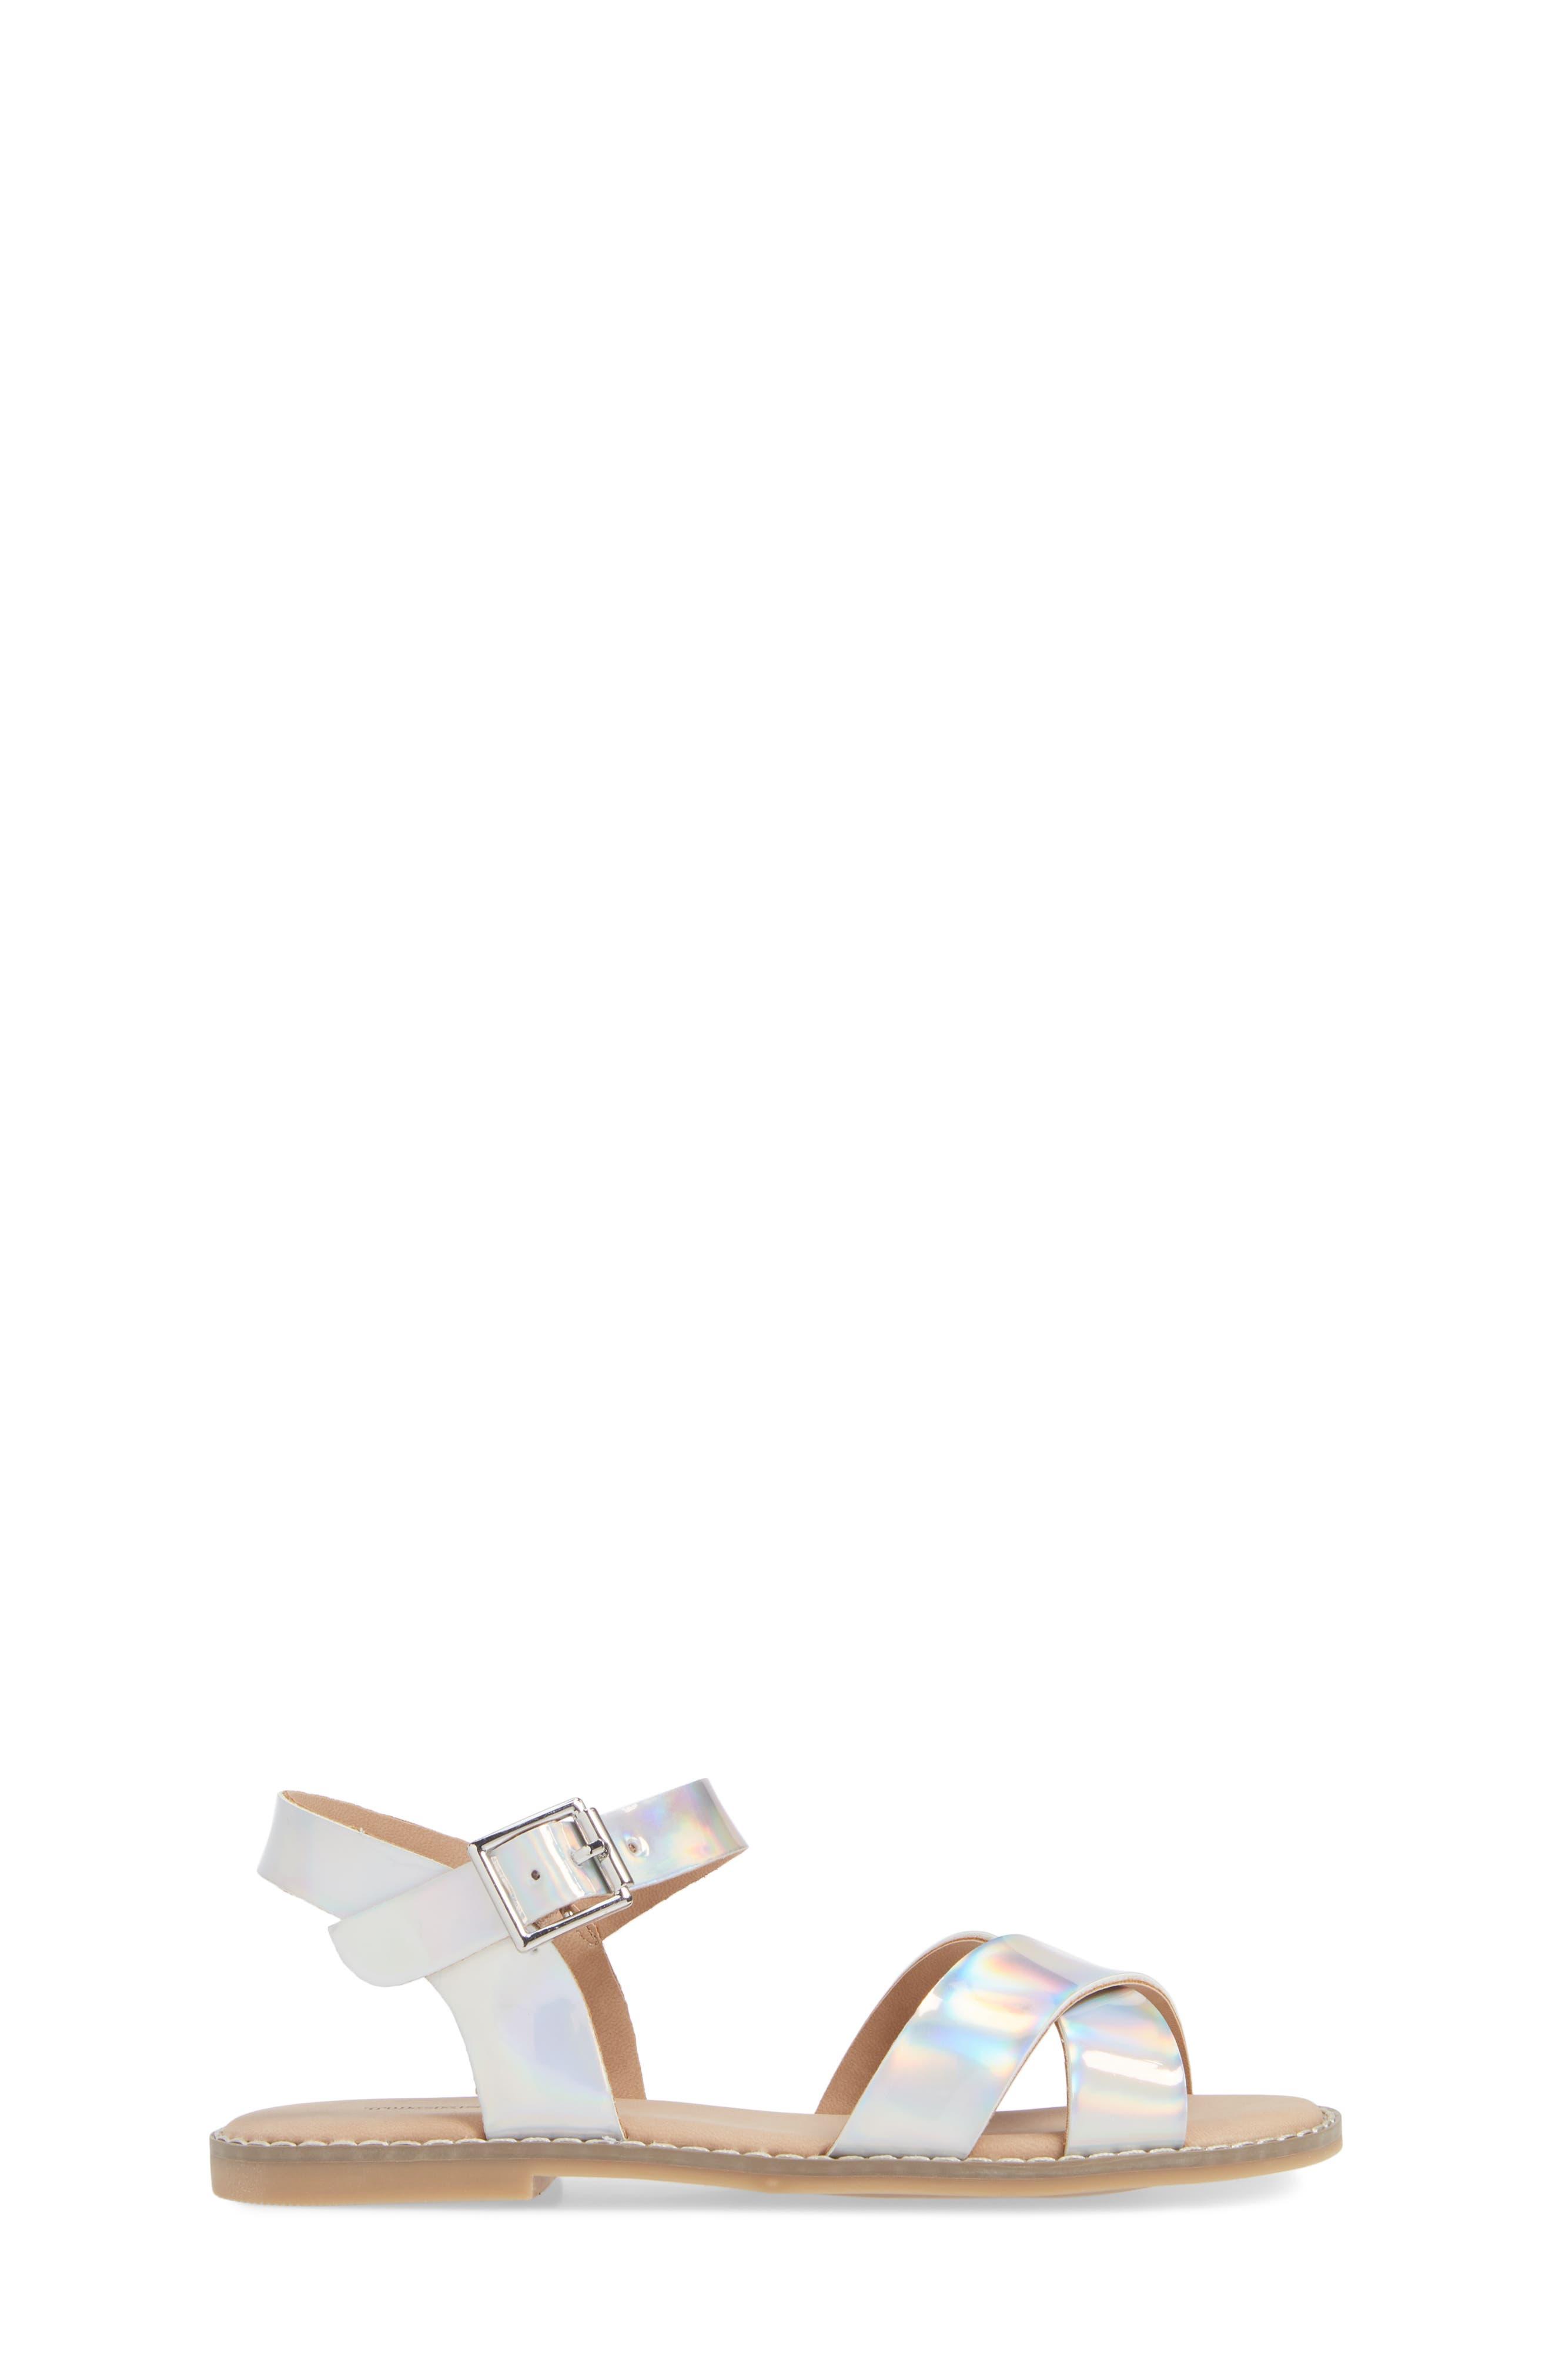 TUCKER + TATE, Arya Cross Strap Sandal, Alternate thumbnail 3, color, SILVER HOLOGRAM FAUX LEATHER